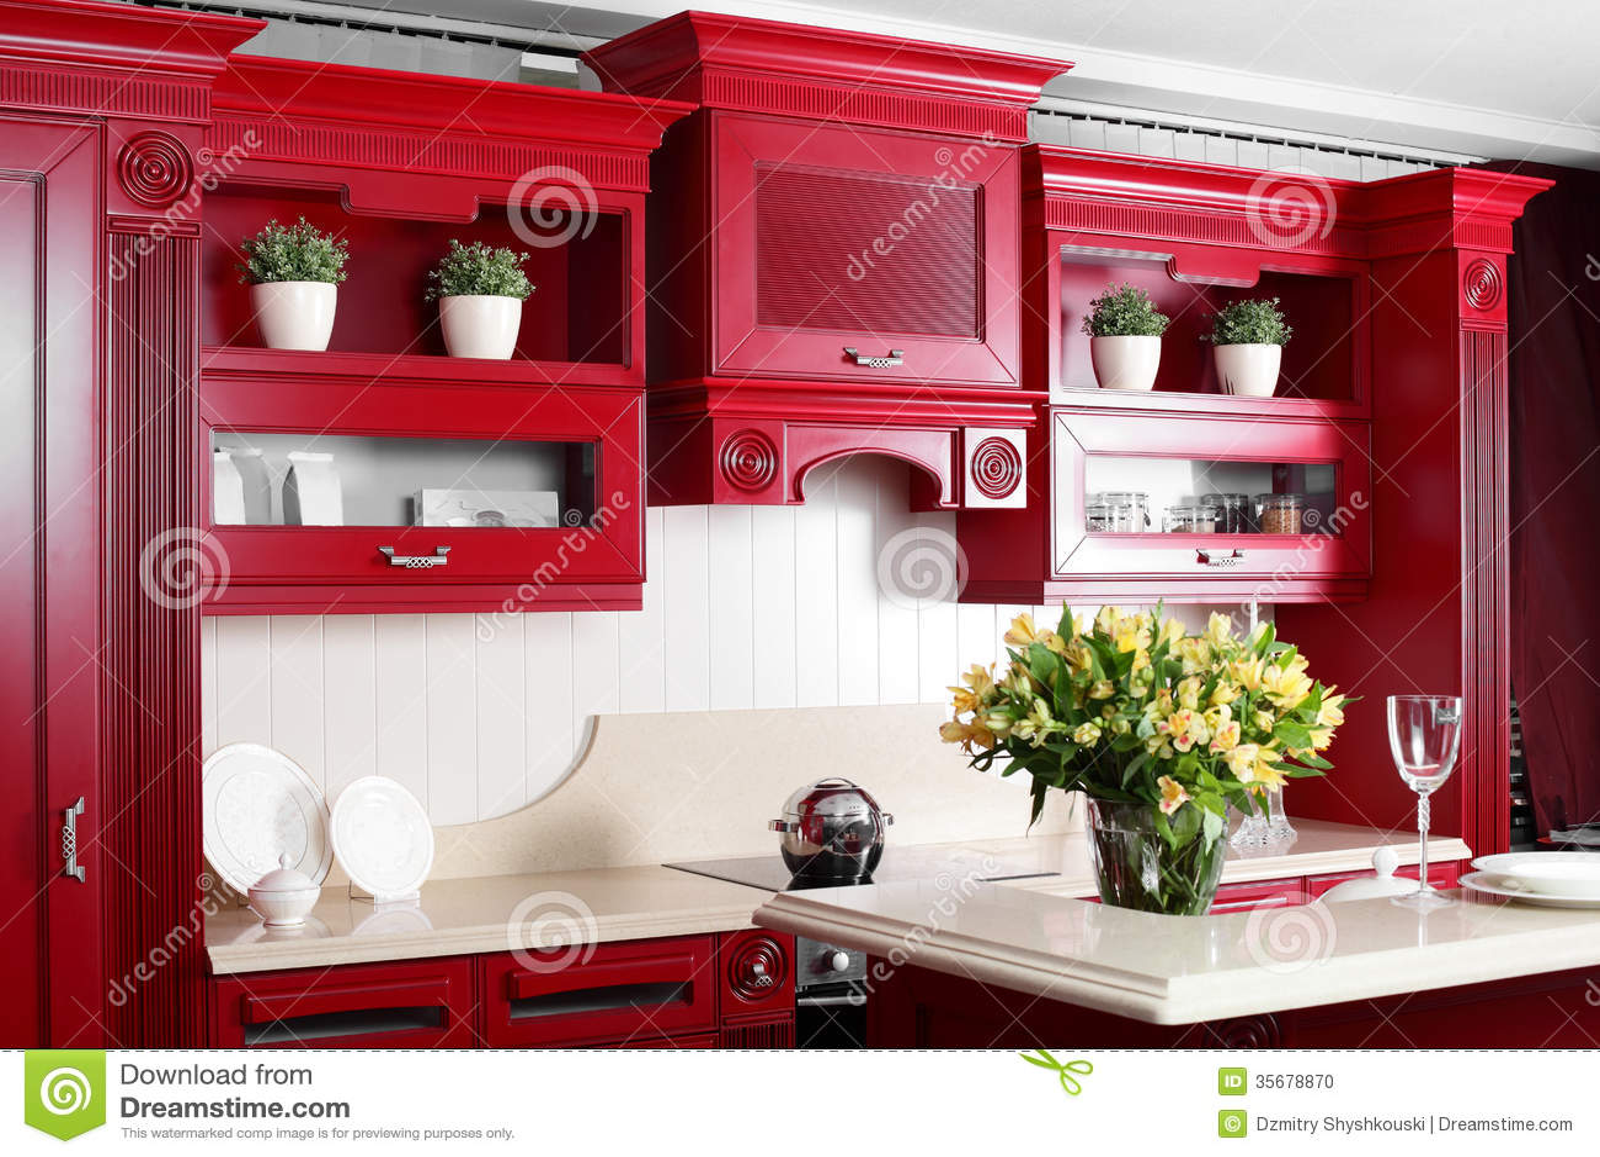 Cucina rossa moderna con mobilia alla moda fotografia - Cucina moderna rossa ...